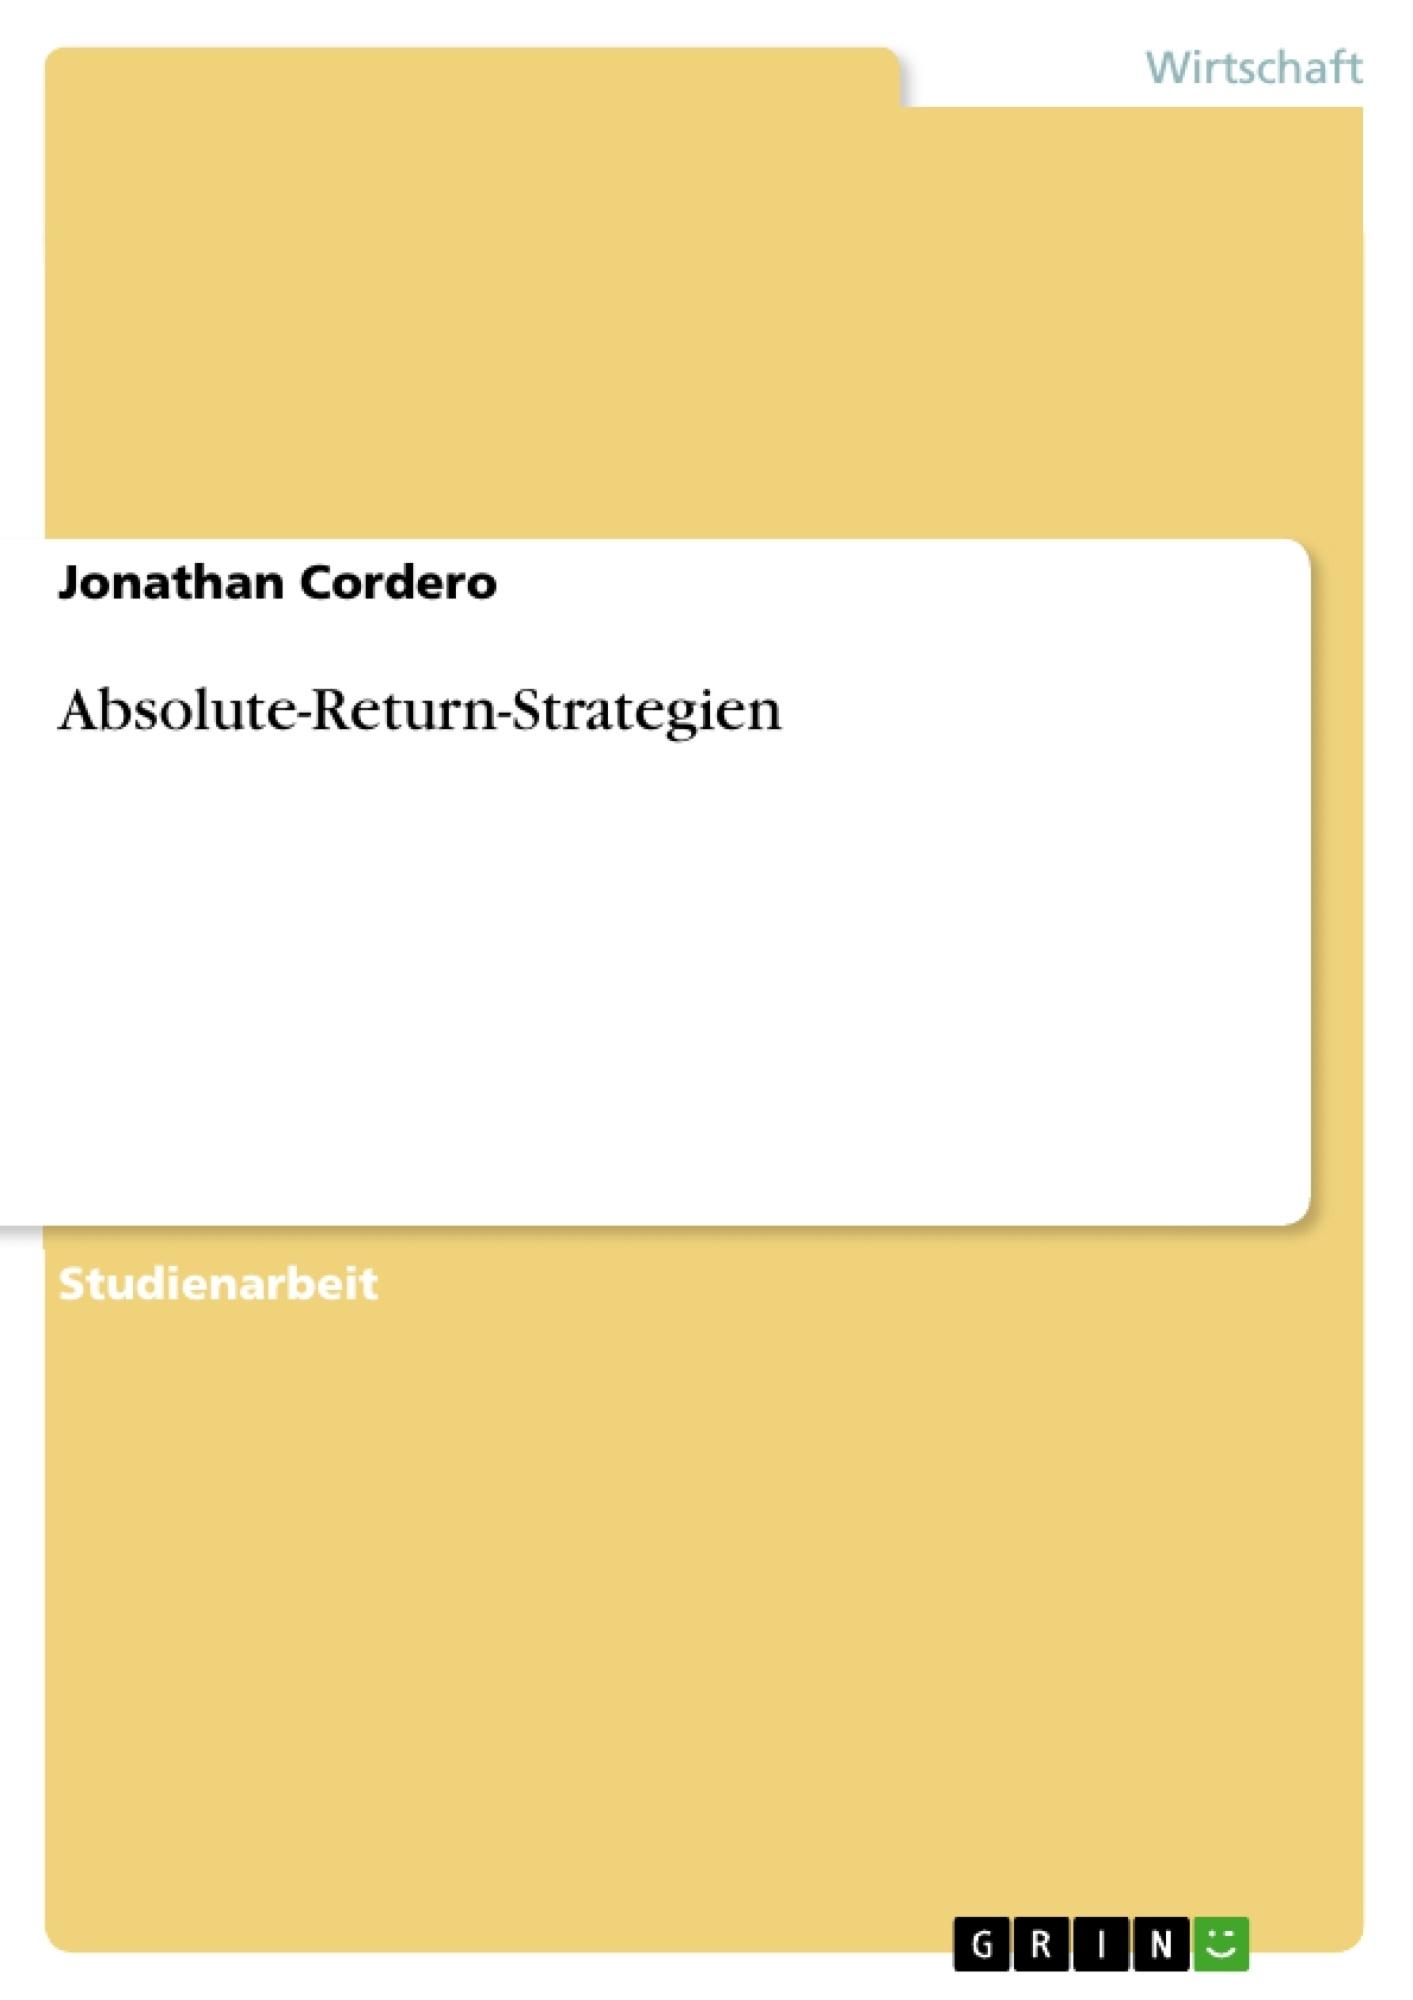 Titel: Absolute-Return-Strategien